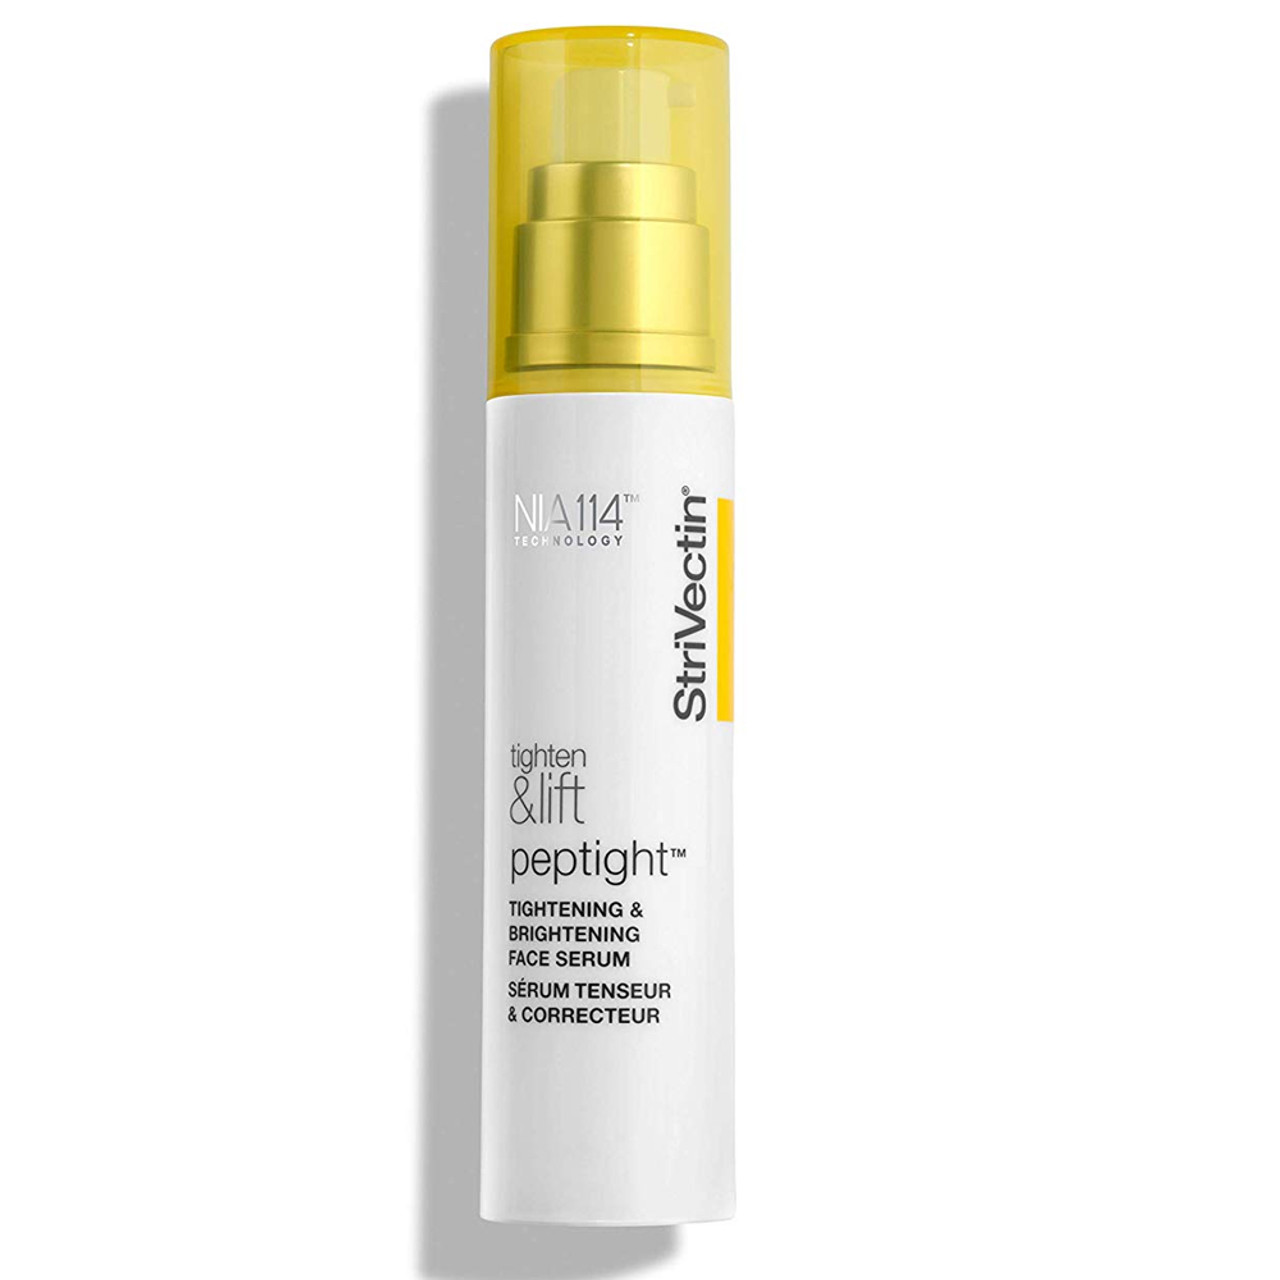 StriVectin Peptight Tightening & Brightening Face Serum  BeautifiedYou.com